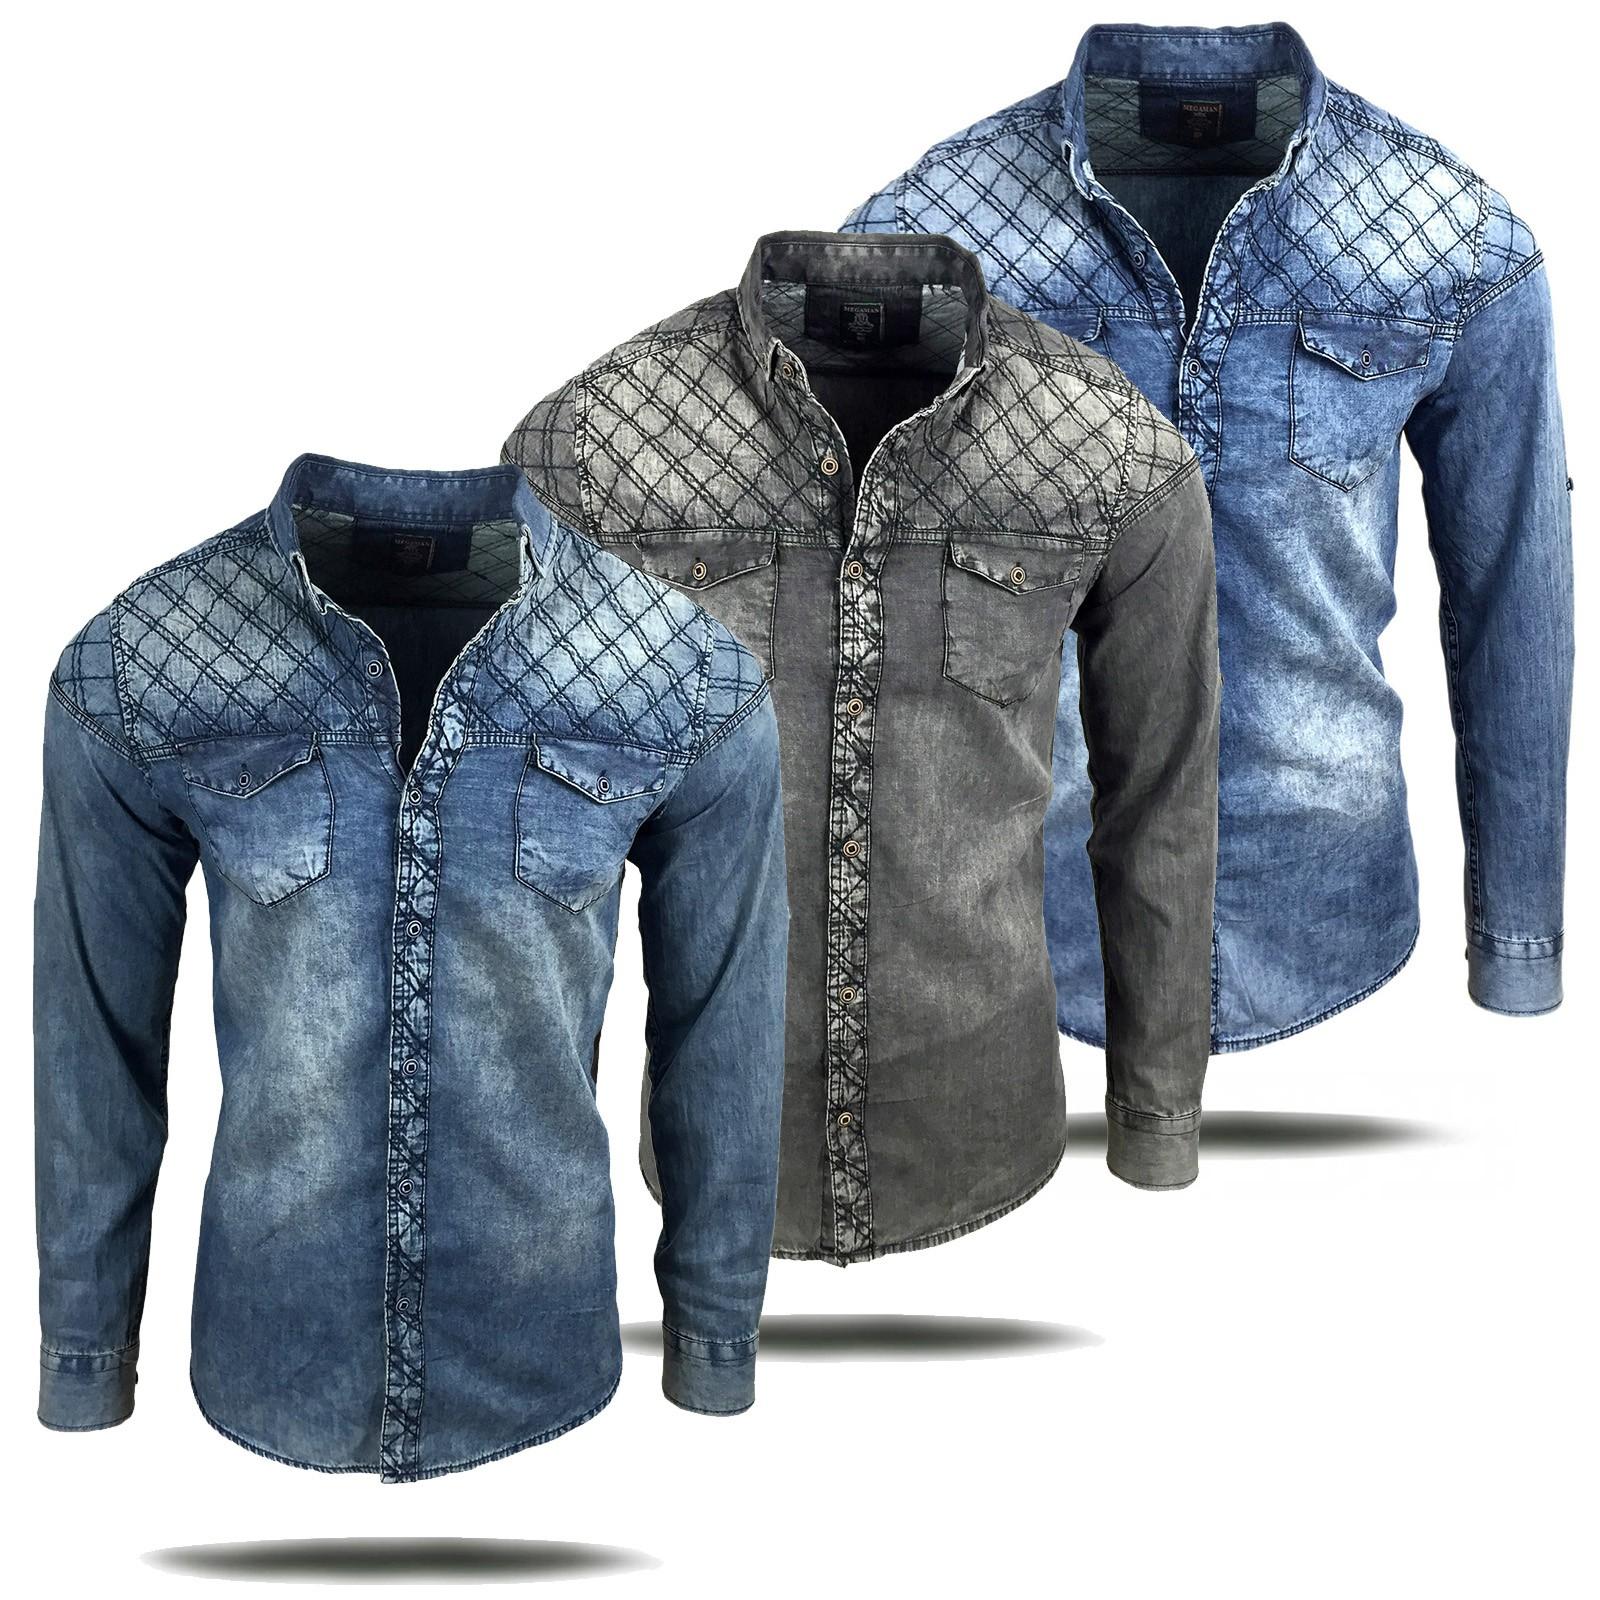 timeless design 5fec2 a565f Herren Jeans Hemd Used Look verwaschen langarm kurzarm blau ...